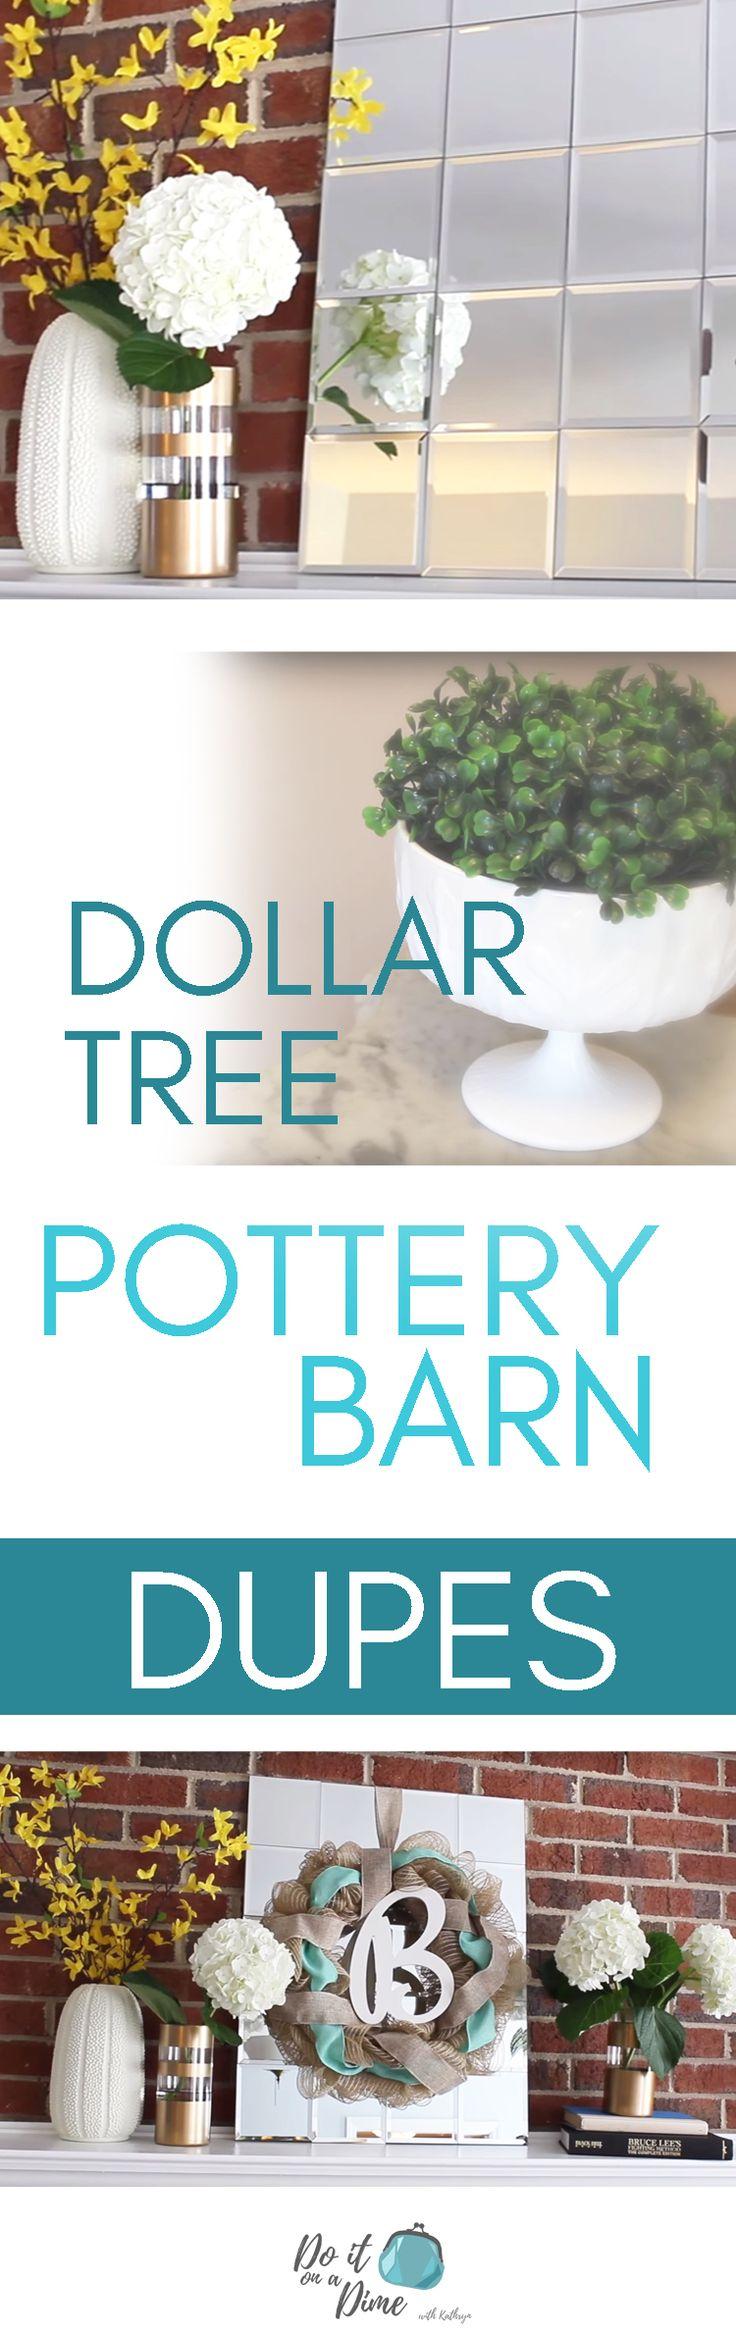 Pottery Barn Decor from Dollar Store!